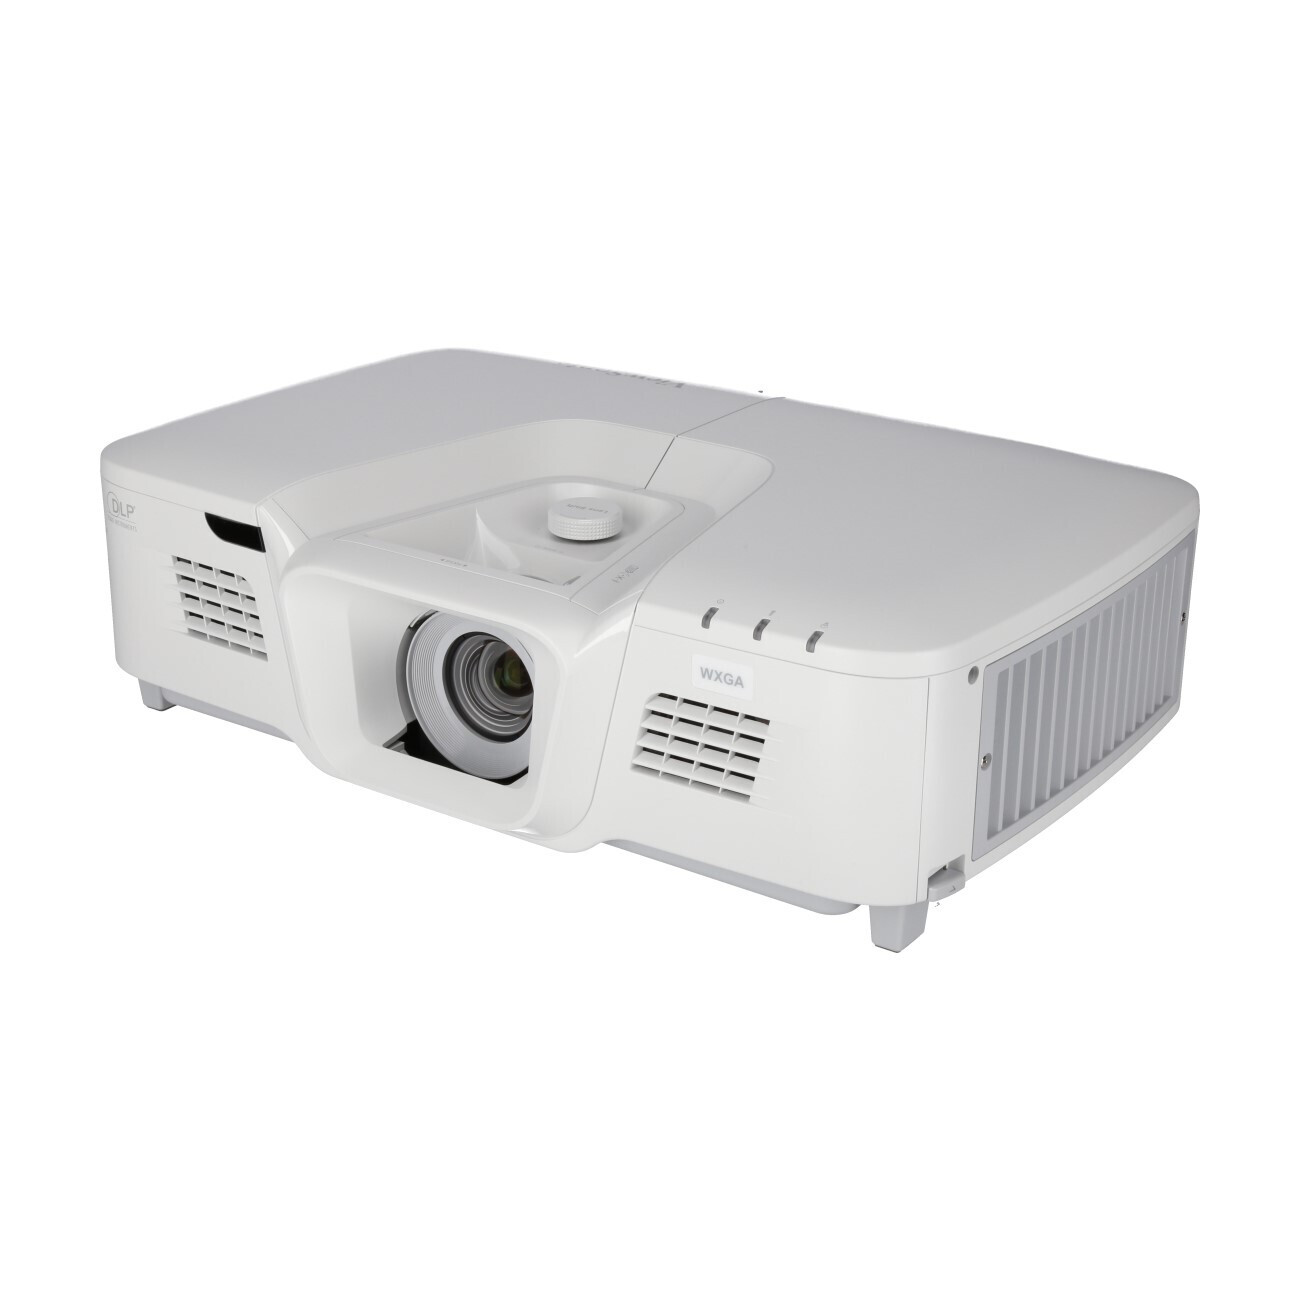 Viewsonic PRO8520WL Business Beamer mit 5200 ANSI-Lumen und WXGA